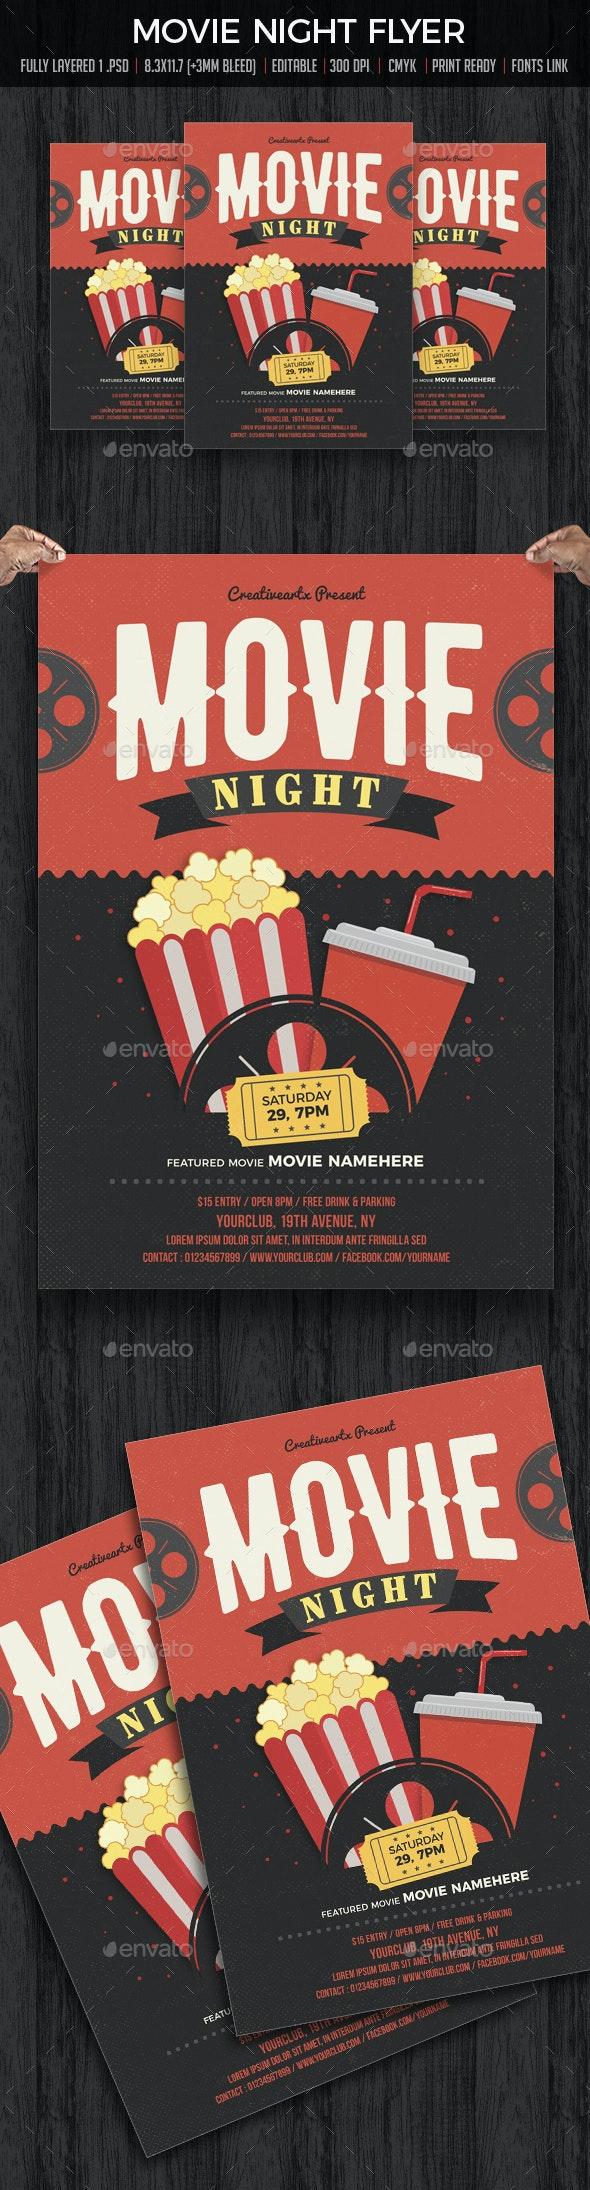 Movie Night / Movie Time Flyer - Flyers Print Templates